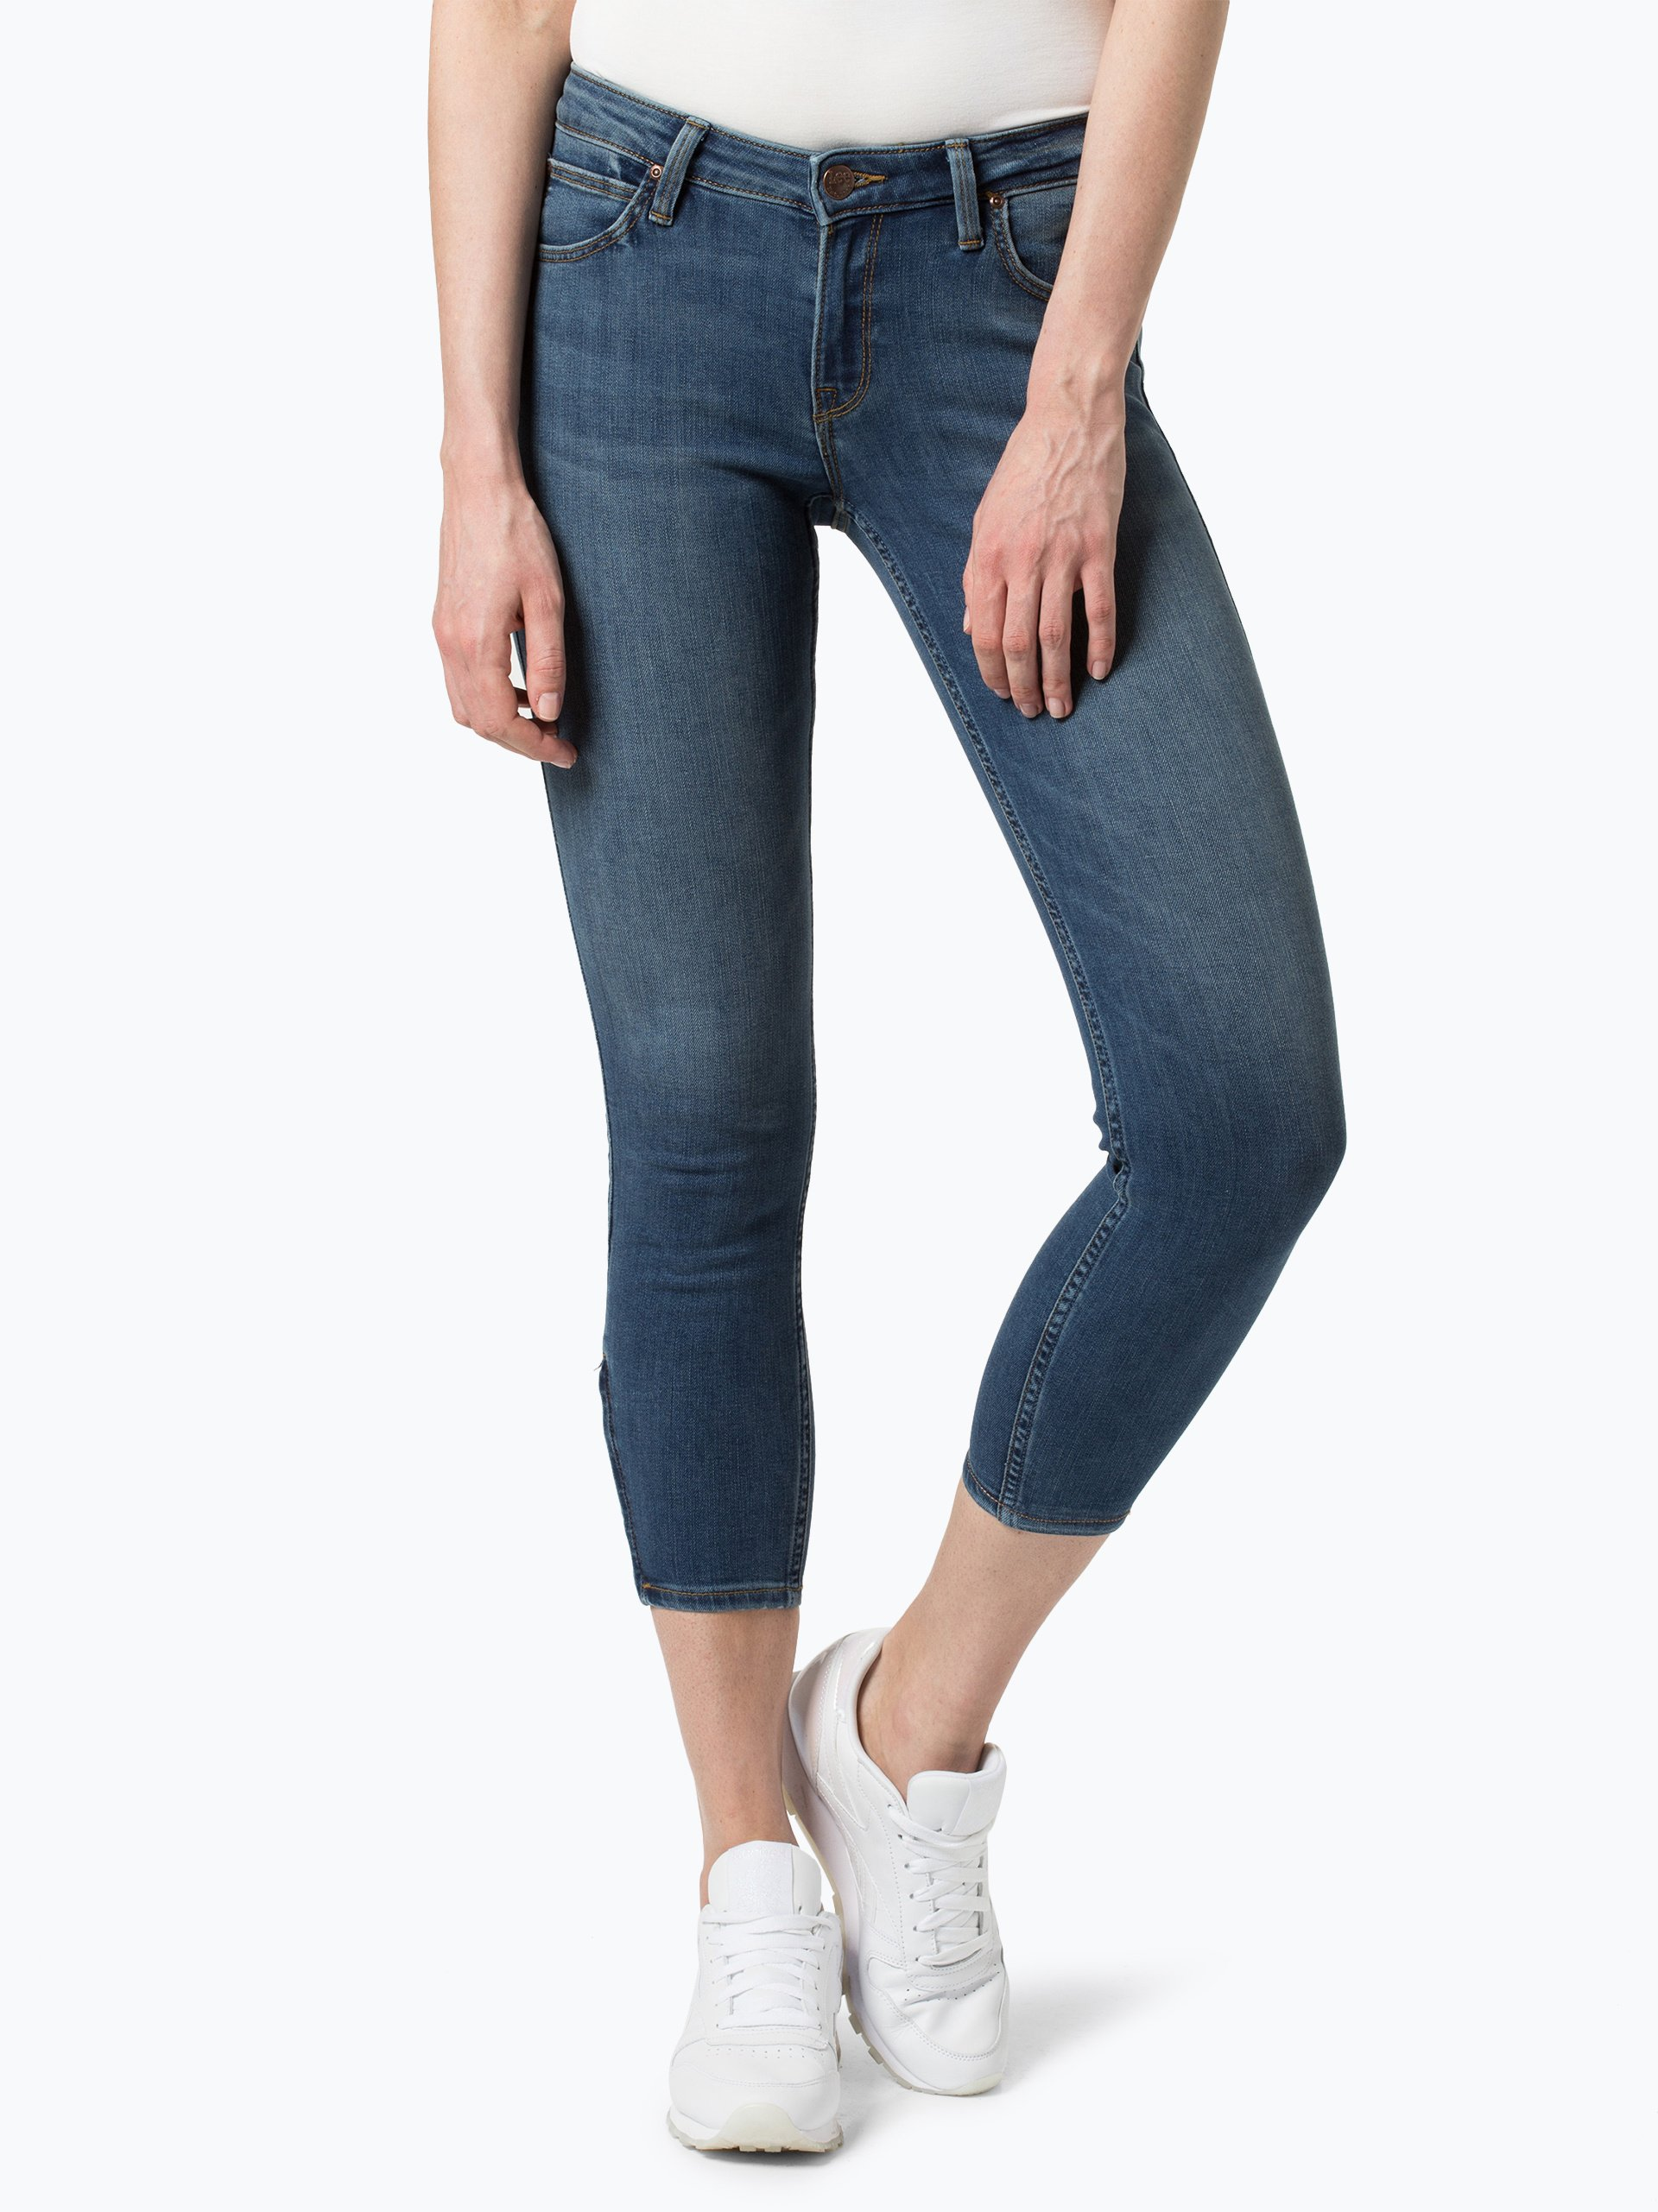 lee damen jeans scarlett cropped blau uni online kaufen. Black Bedroom Furniture Sets. Home Design Ideas